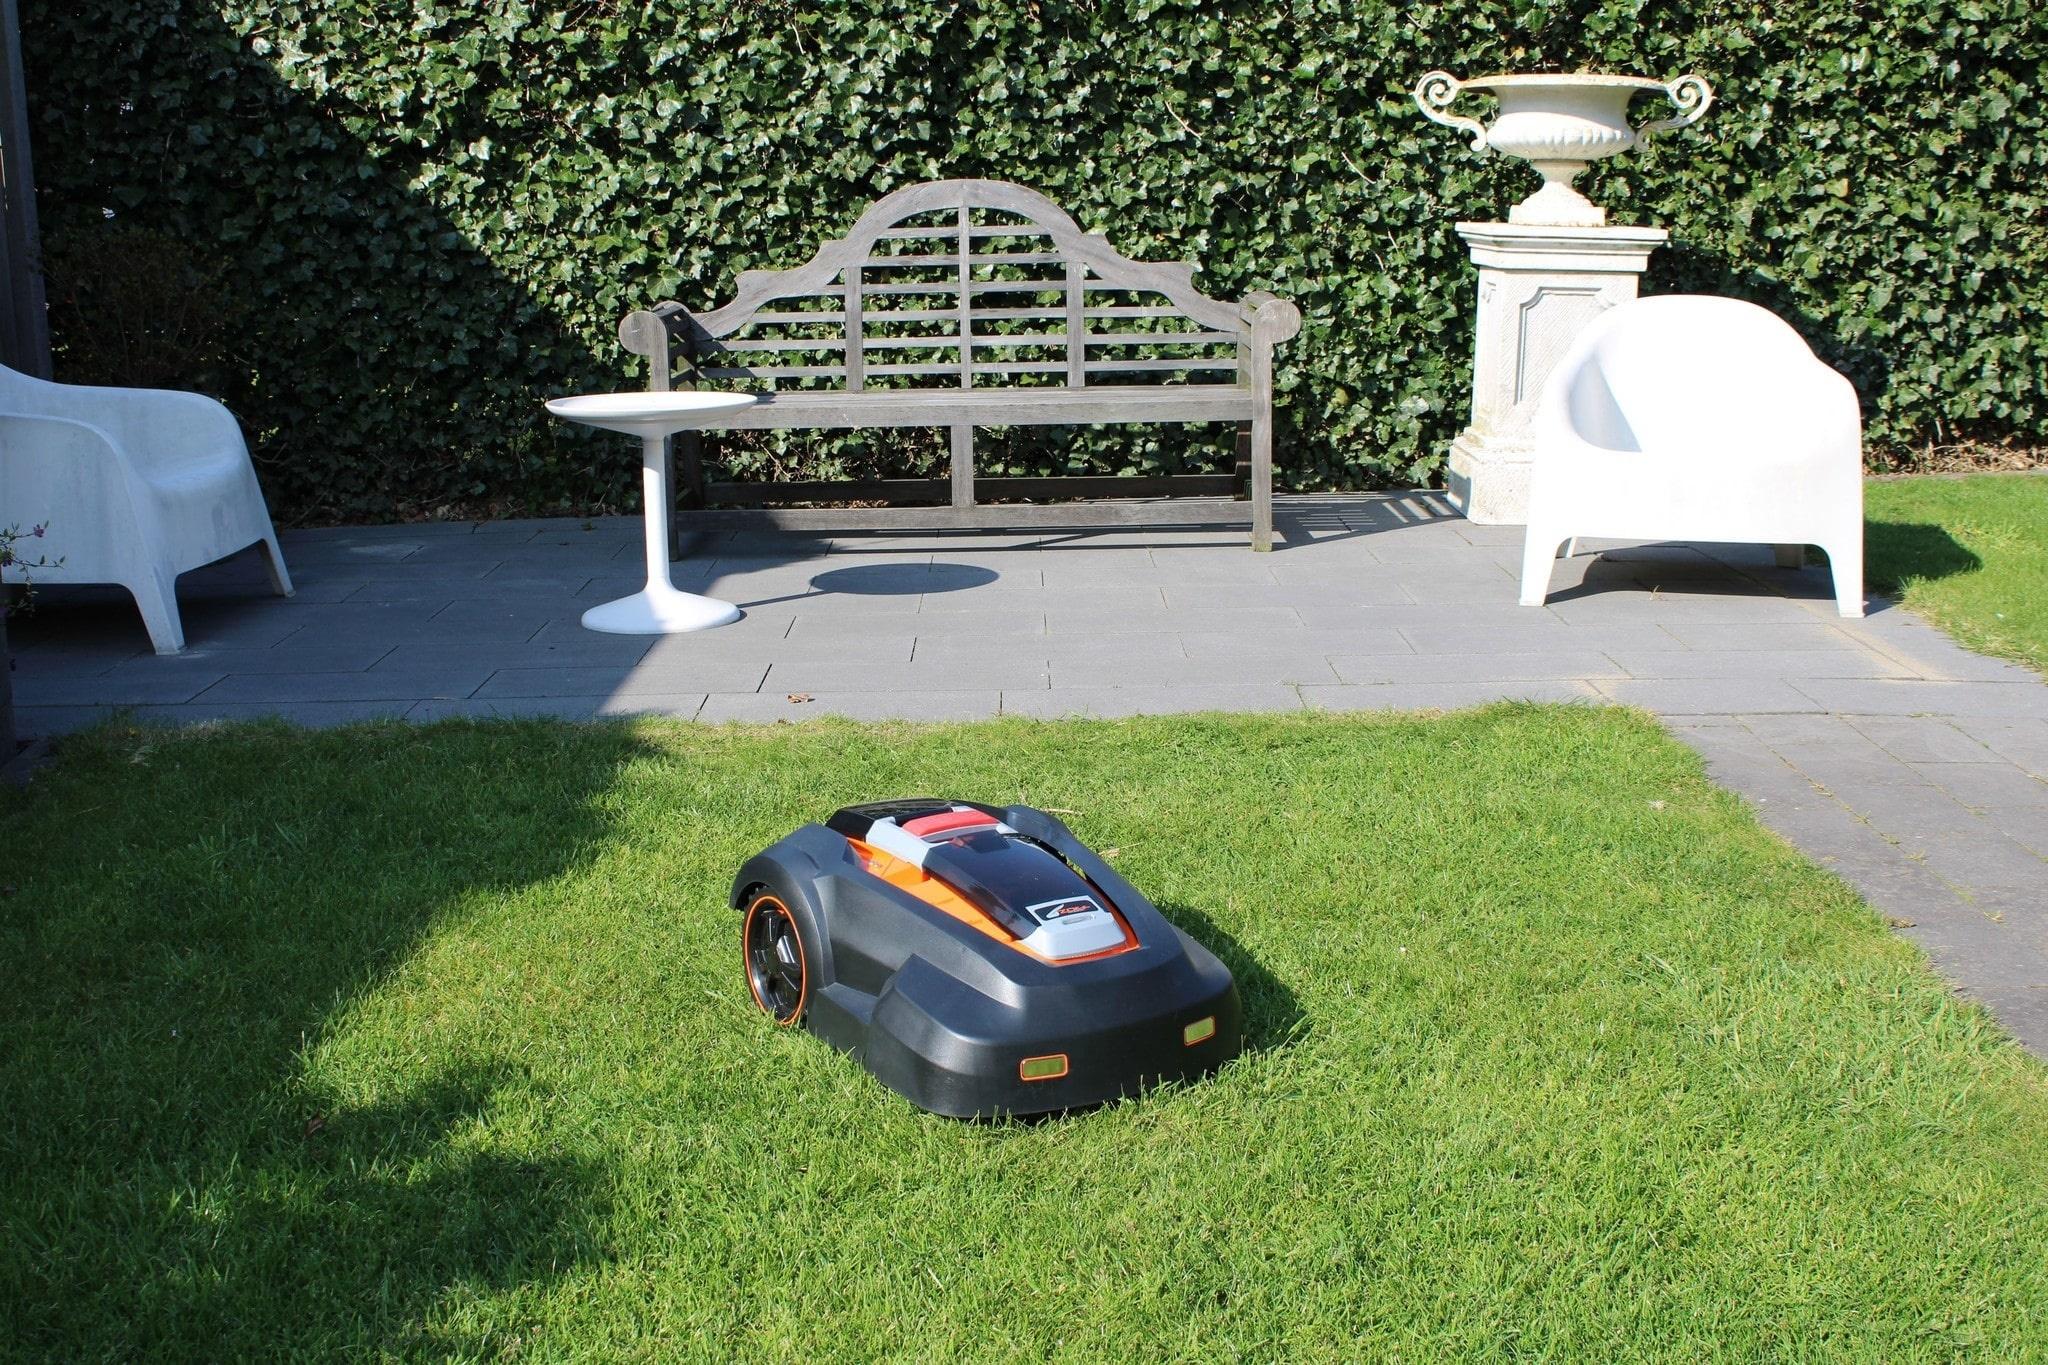 robotic-mower-harm